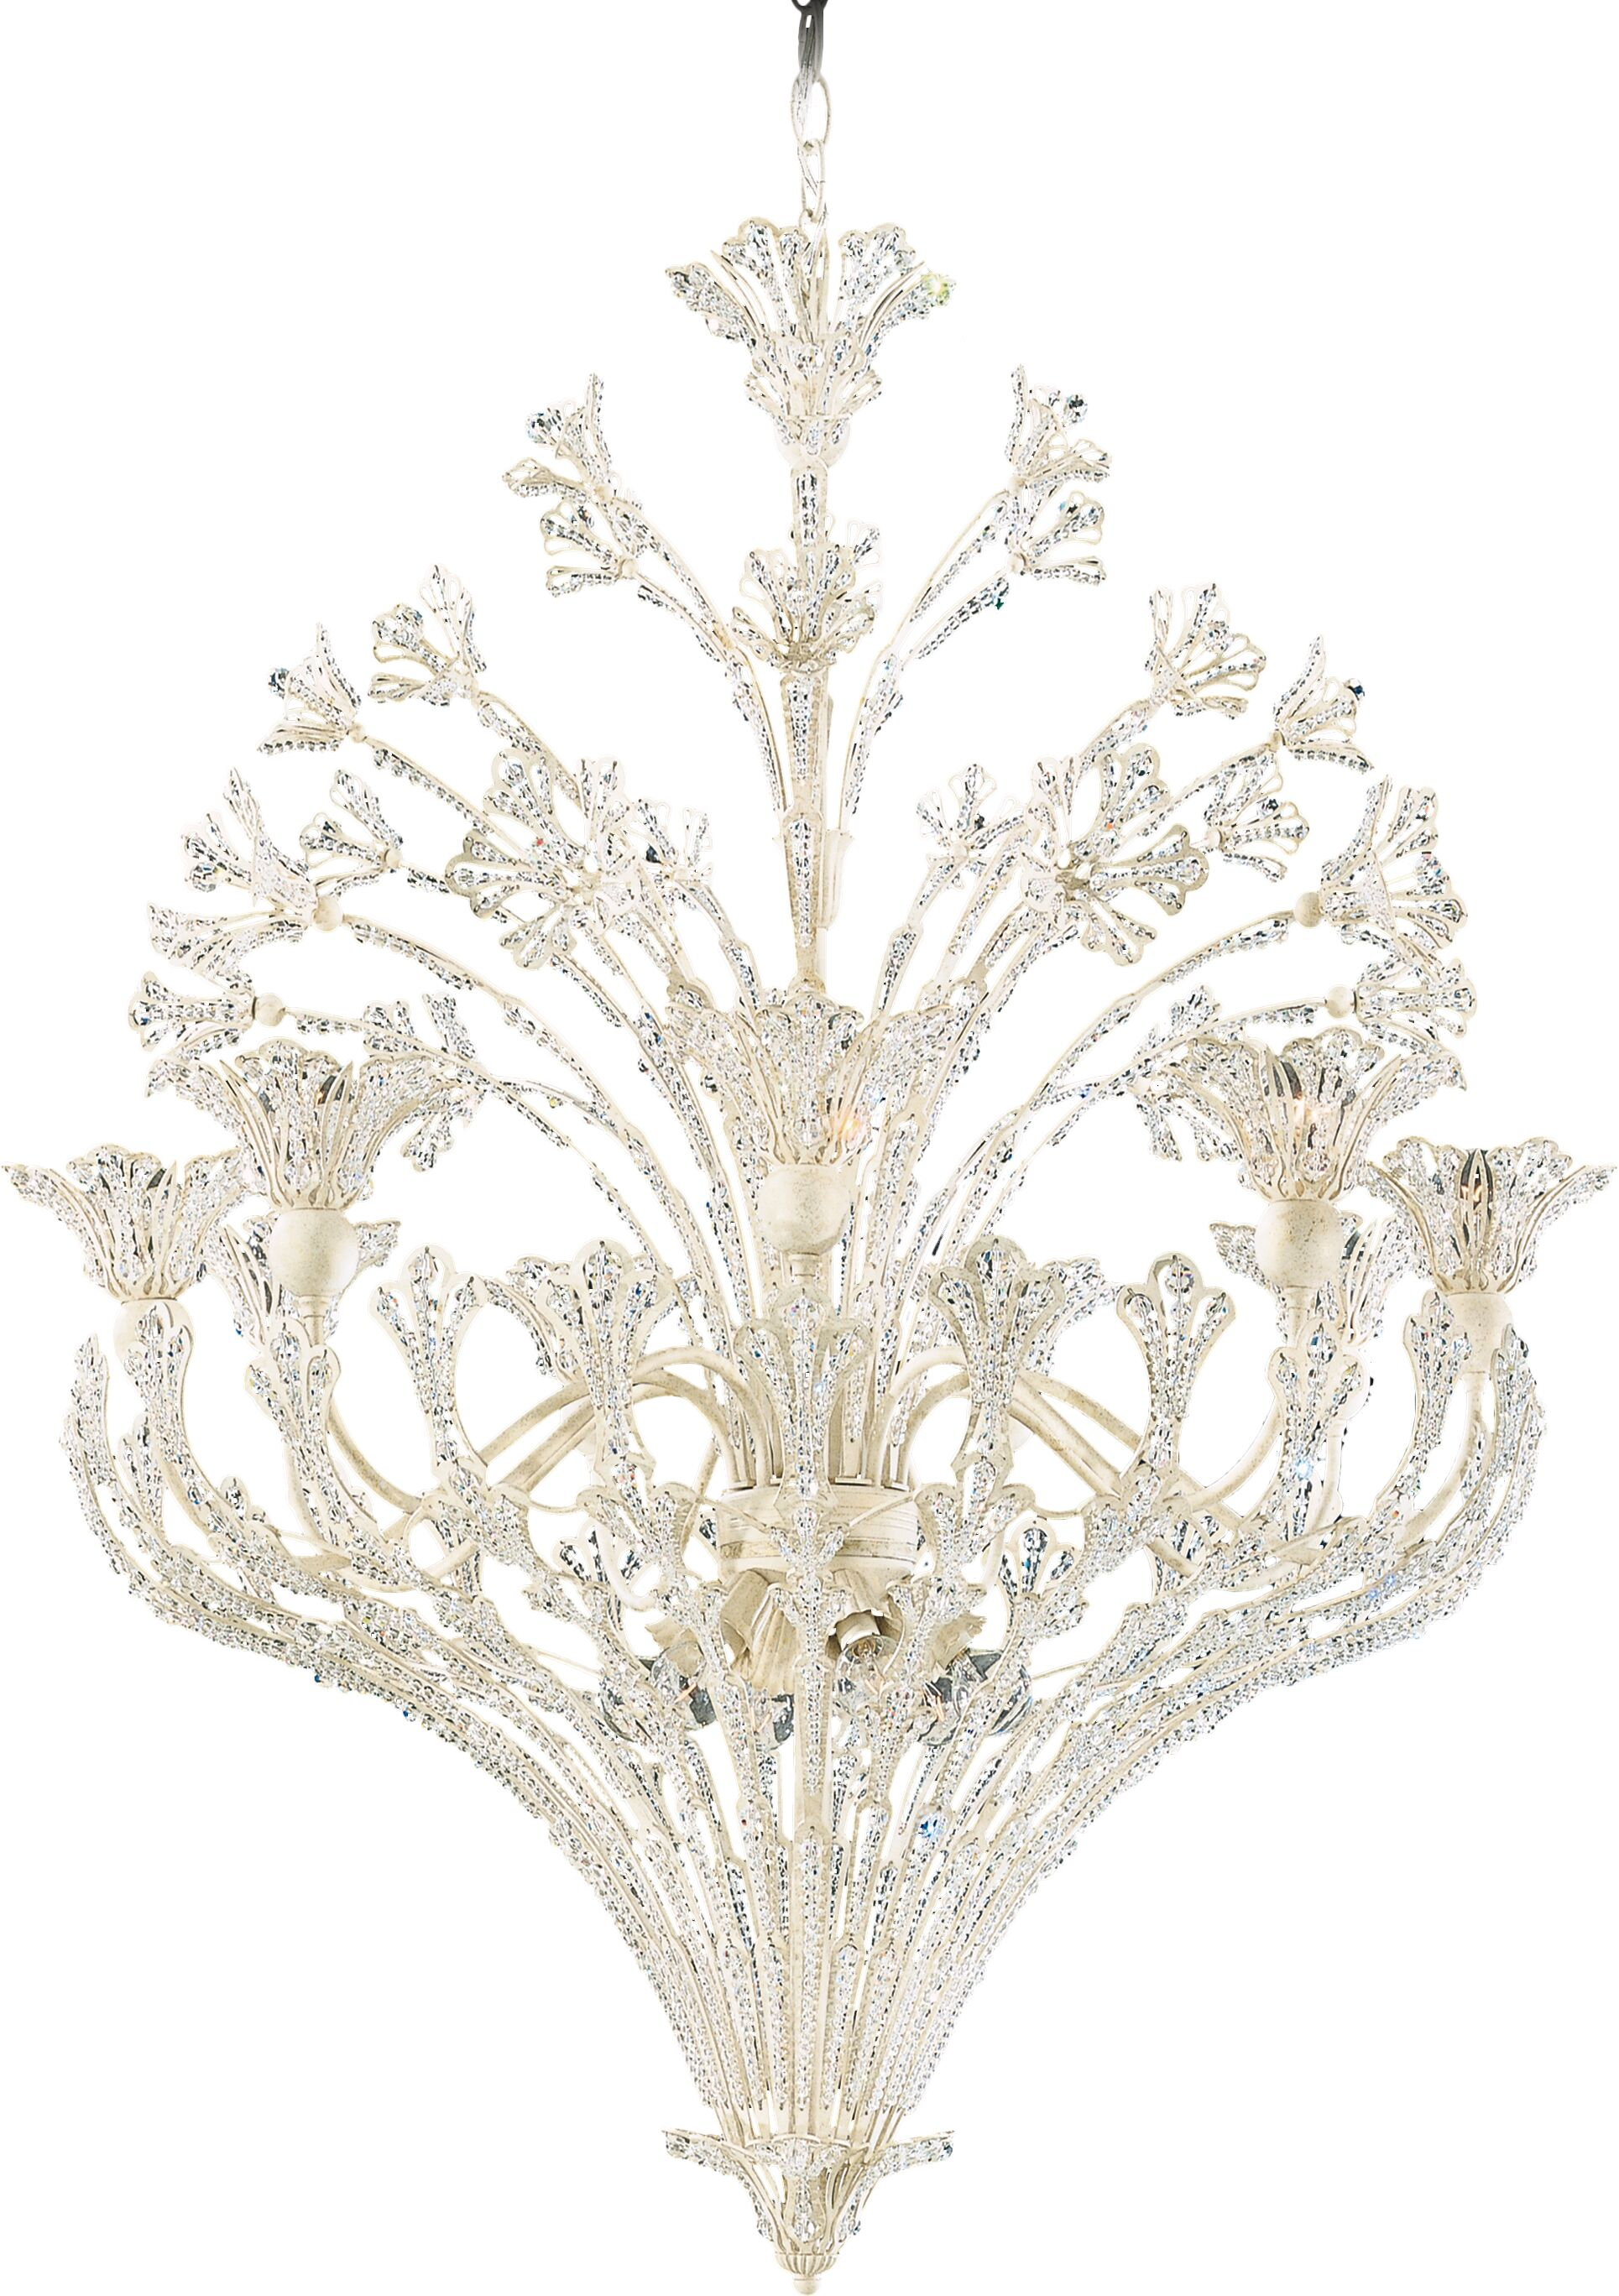 Rivendell 15-Light Crystal Chandelier Finish: Etruscan Gold, Crystal: Swarovski Spectra